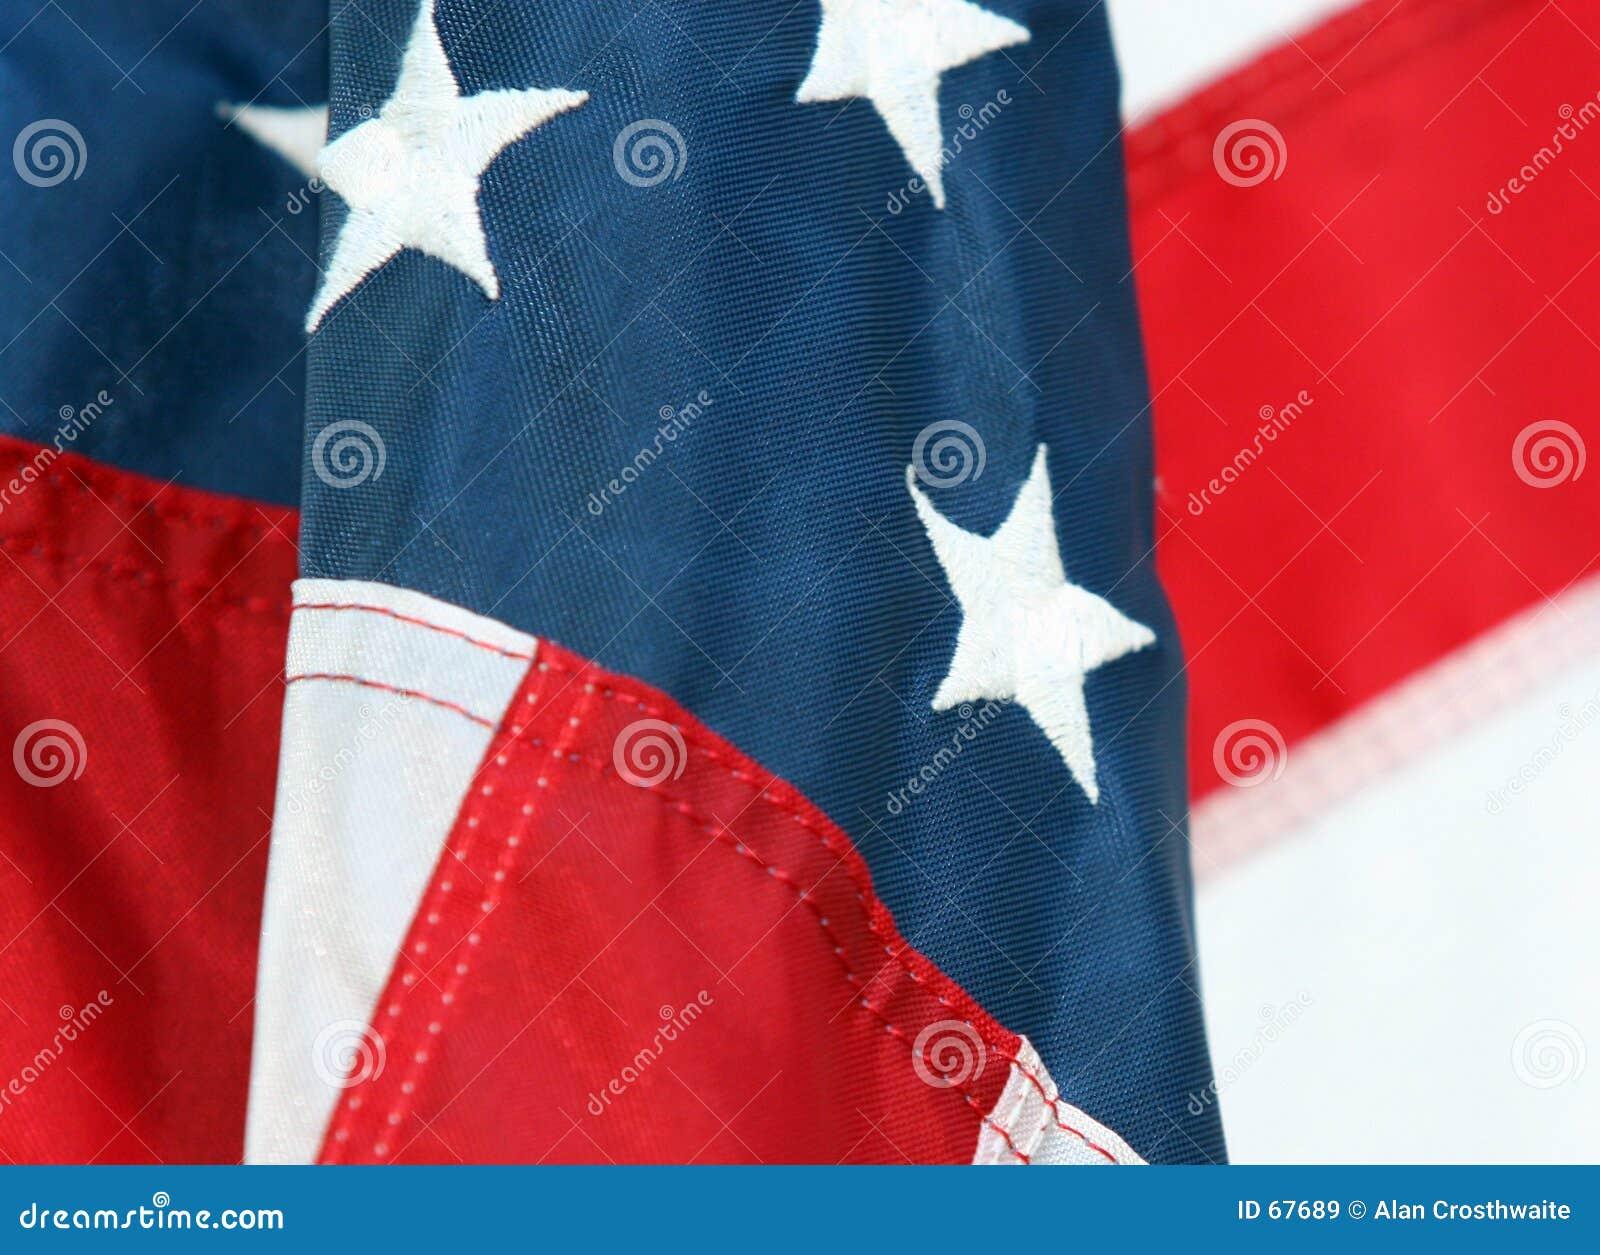 América simbólica